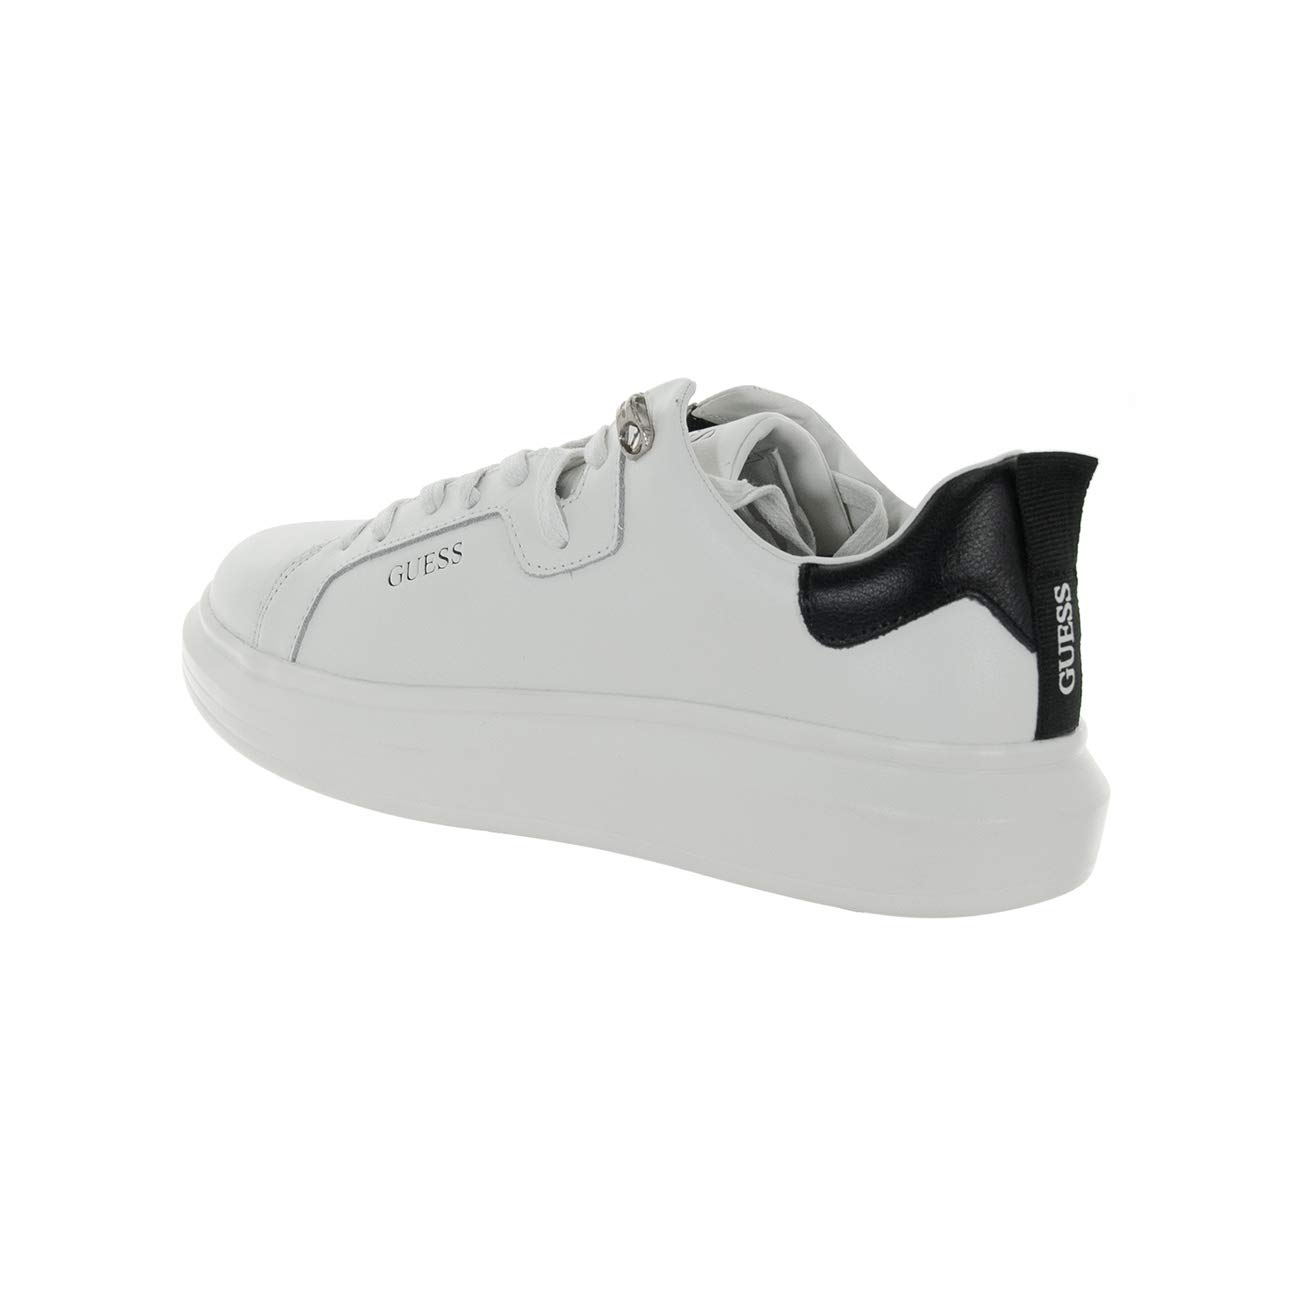 Guess Scarpe Uomo Sneaker Kurt Logo in Pelle White